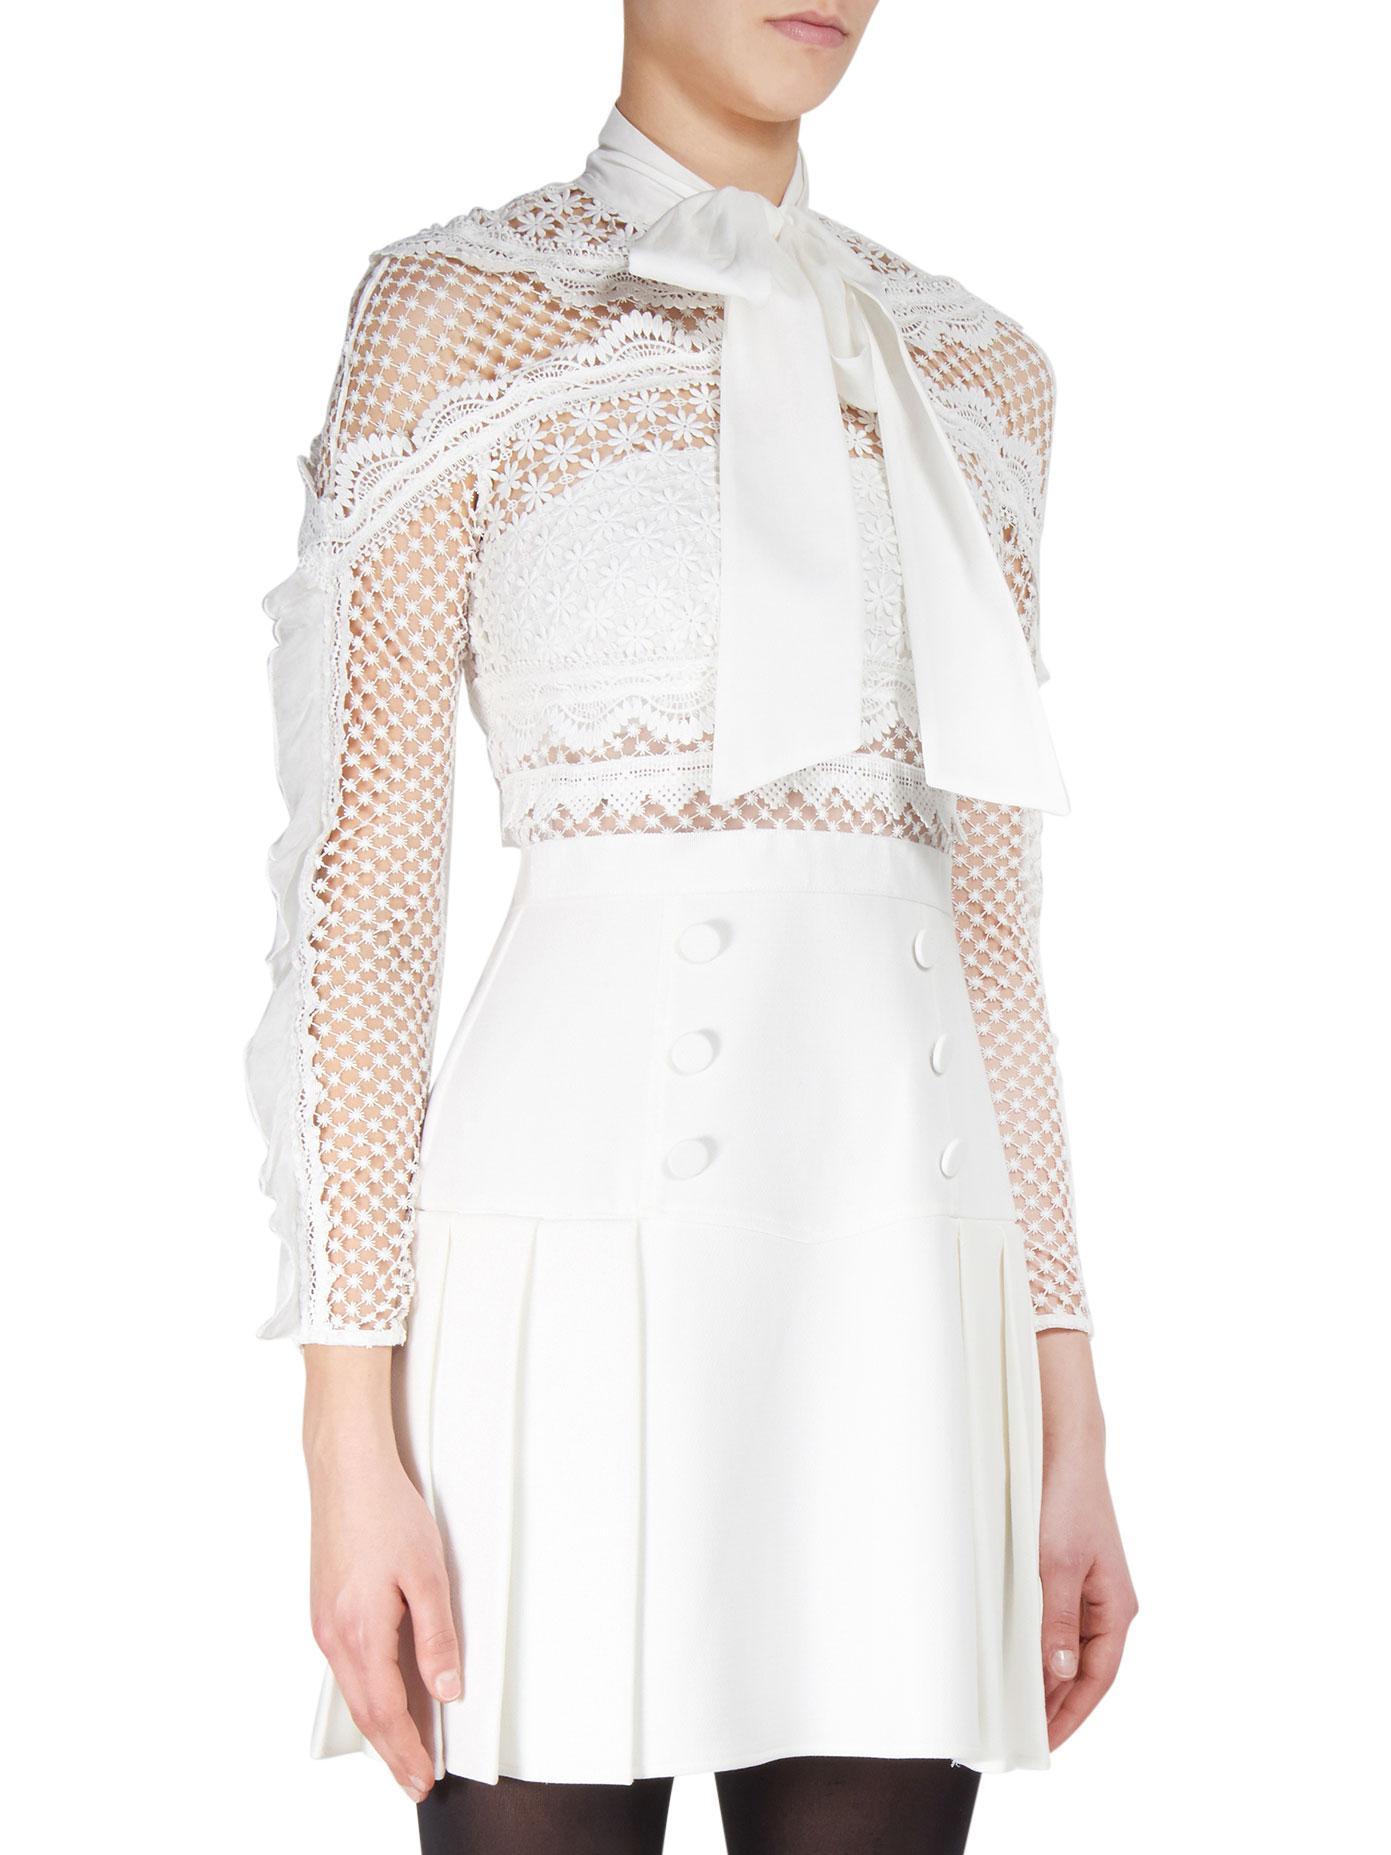 c6ddd63270e6 Bellis Lace Trim Dress With Full Skirt | Saddha